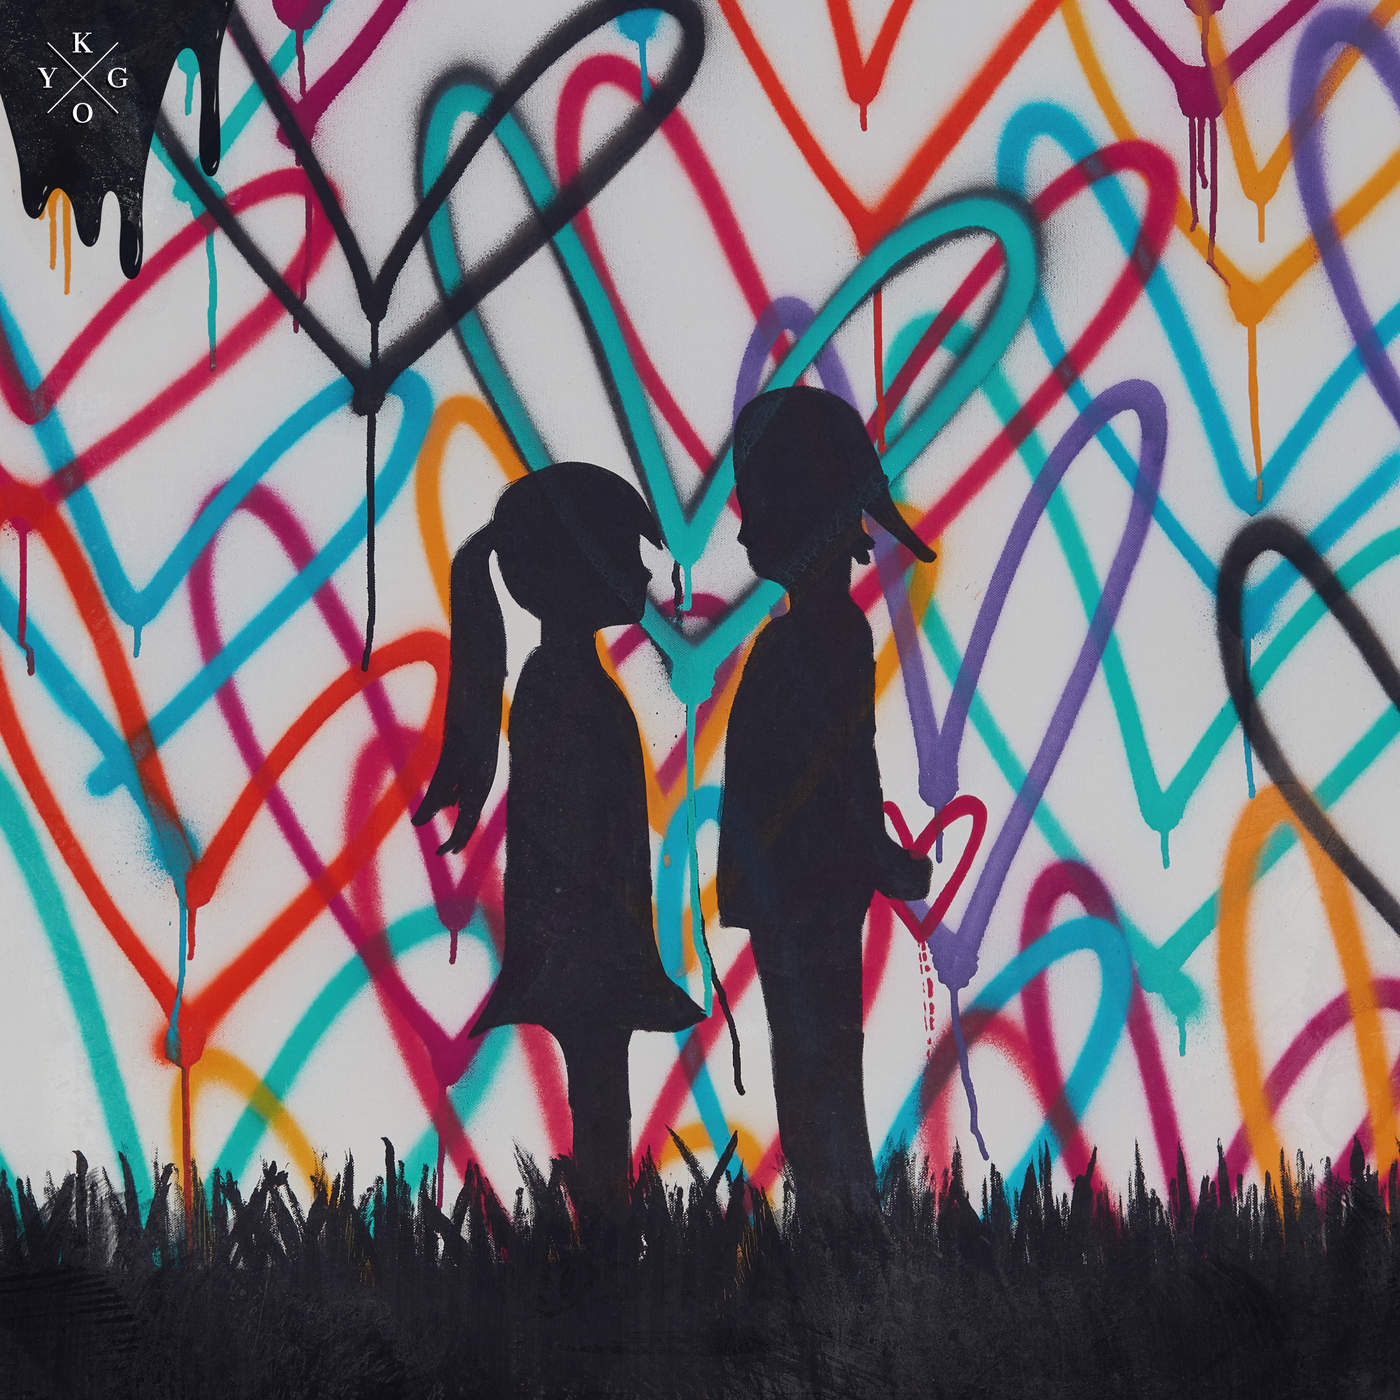 Kygo - Sunrise (feat. Jason Walker) - Single